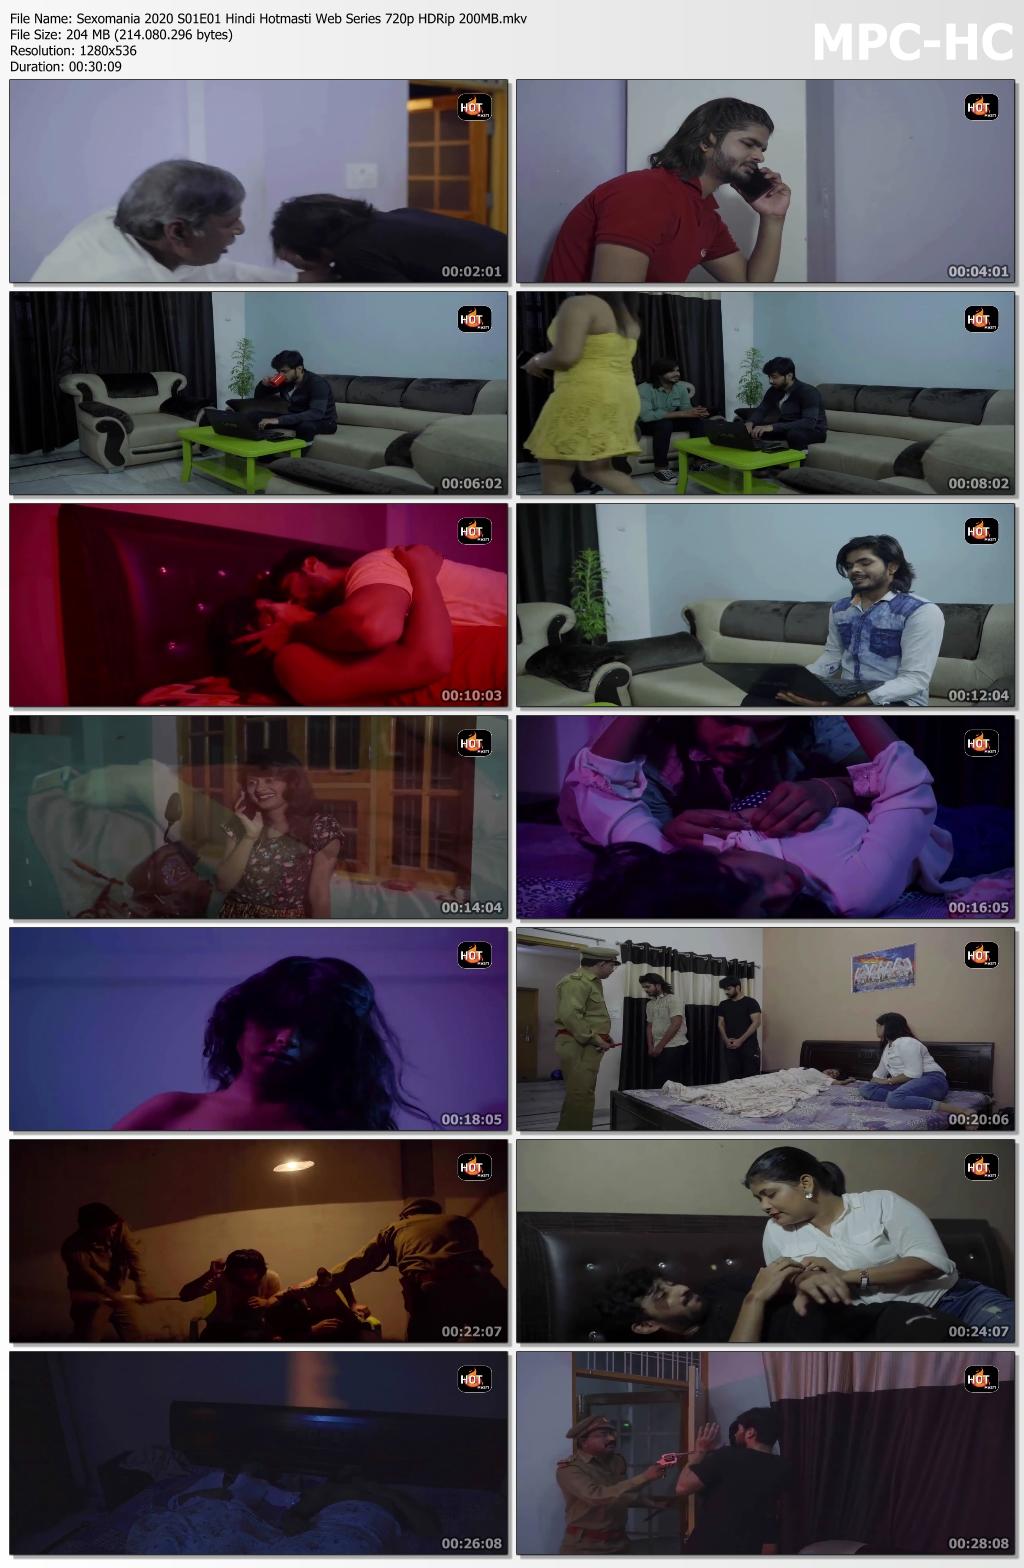 Sexomania-2020-S01-E01-Hindi-Hotmasti-Web-Series-720p-HDRip-200-MB-mkv-thumbs